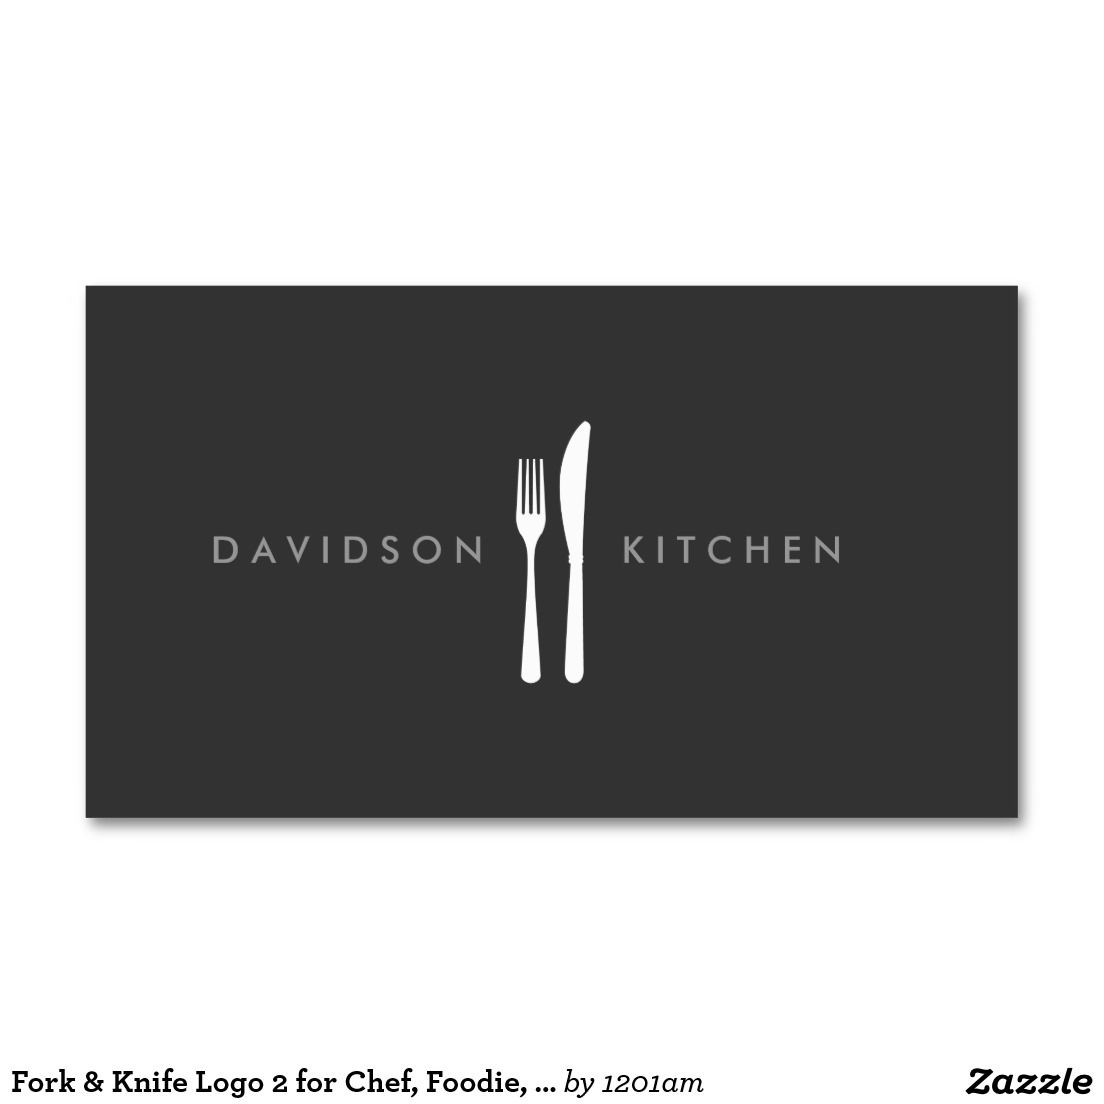 Fork knife logo 2 for chef foodie restaurant business card fork knife logo 2 for chef foodie restaurant business card colourmoves